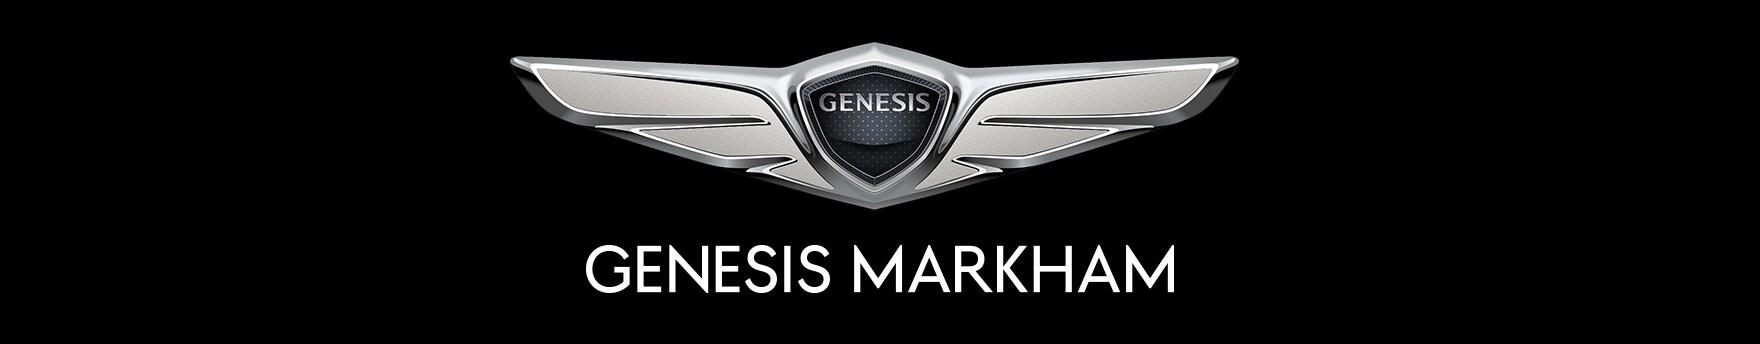 Genesis Markham